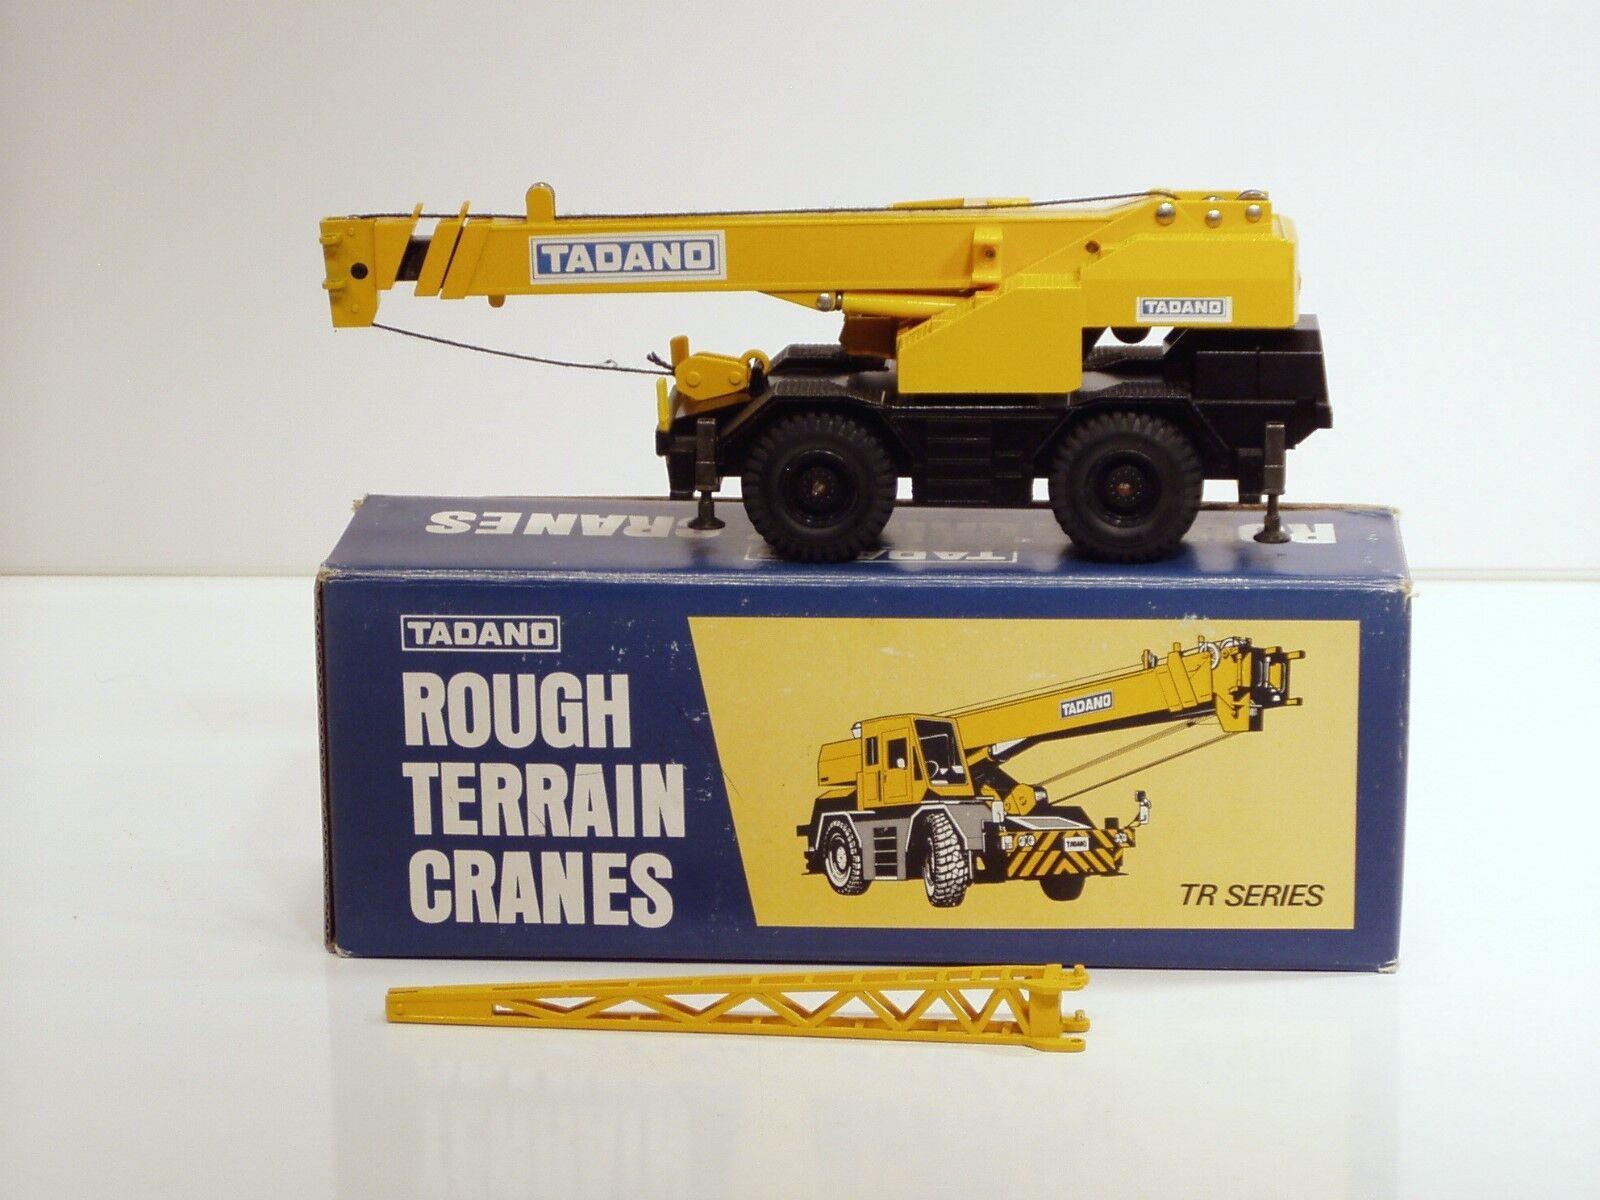 Tadano TR Series Rough Terrain Crane - 1 50 - Japon-Comme neuf IN BOX